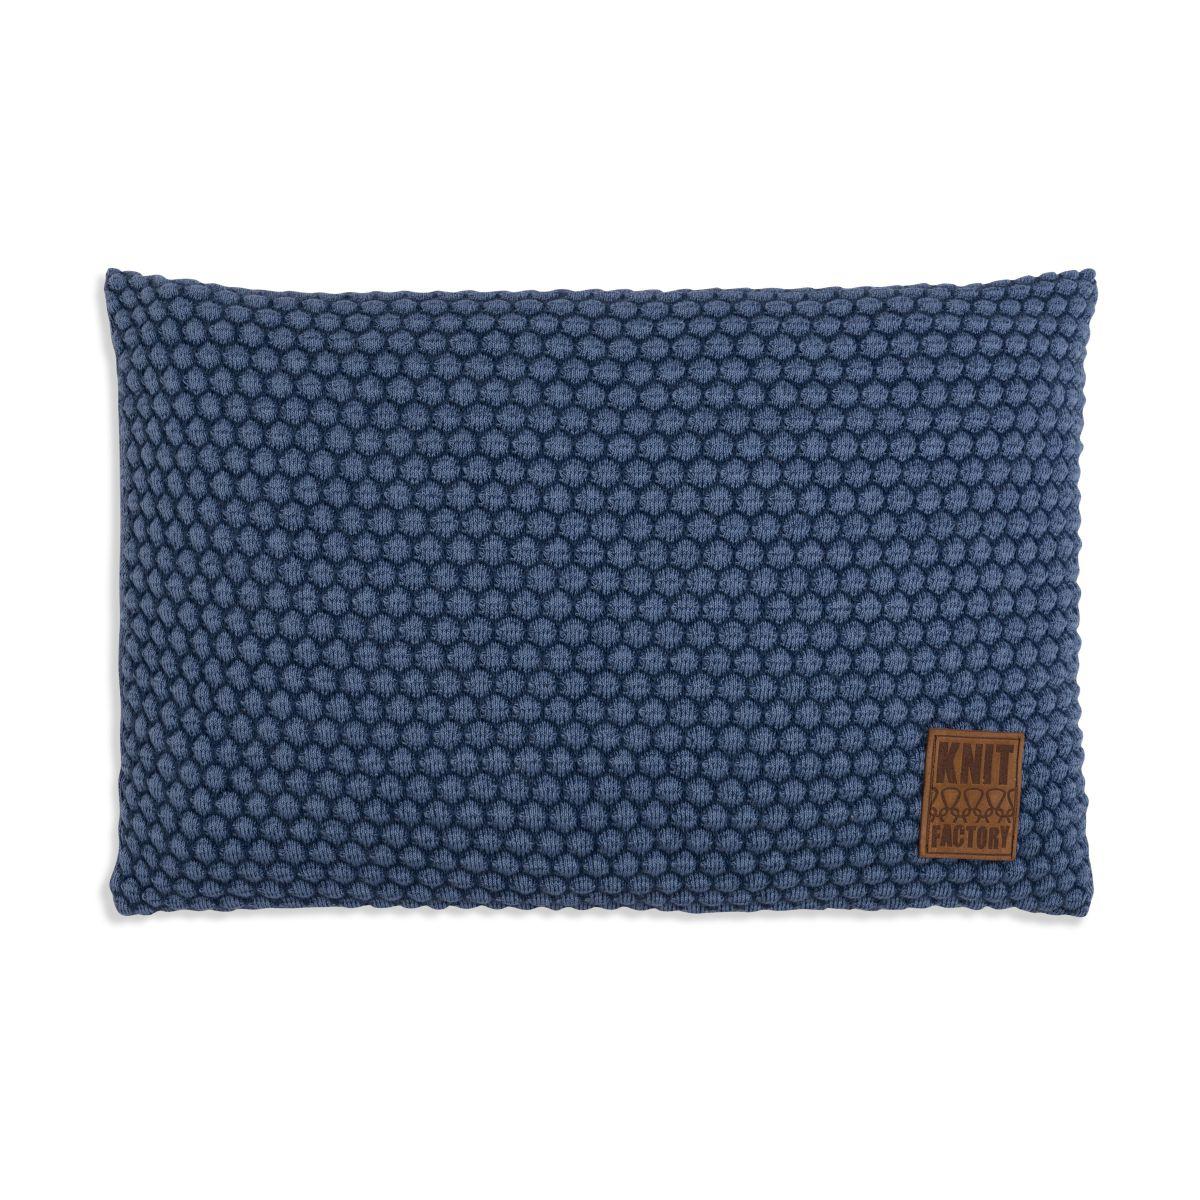 knit factory 1241354 kussen 60x40 juul jeans indigo 1